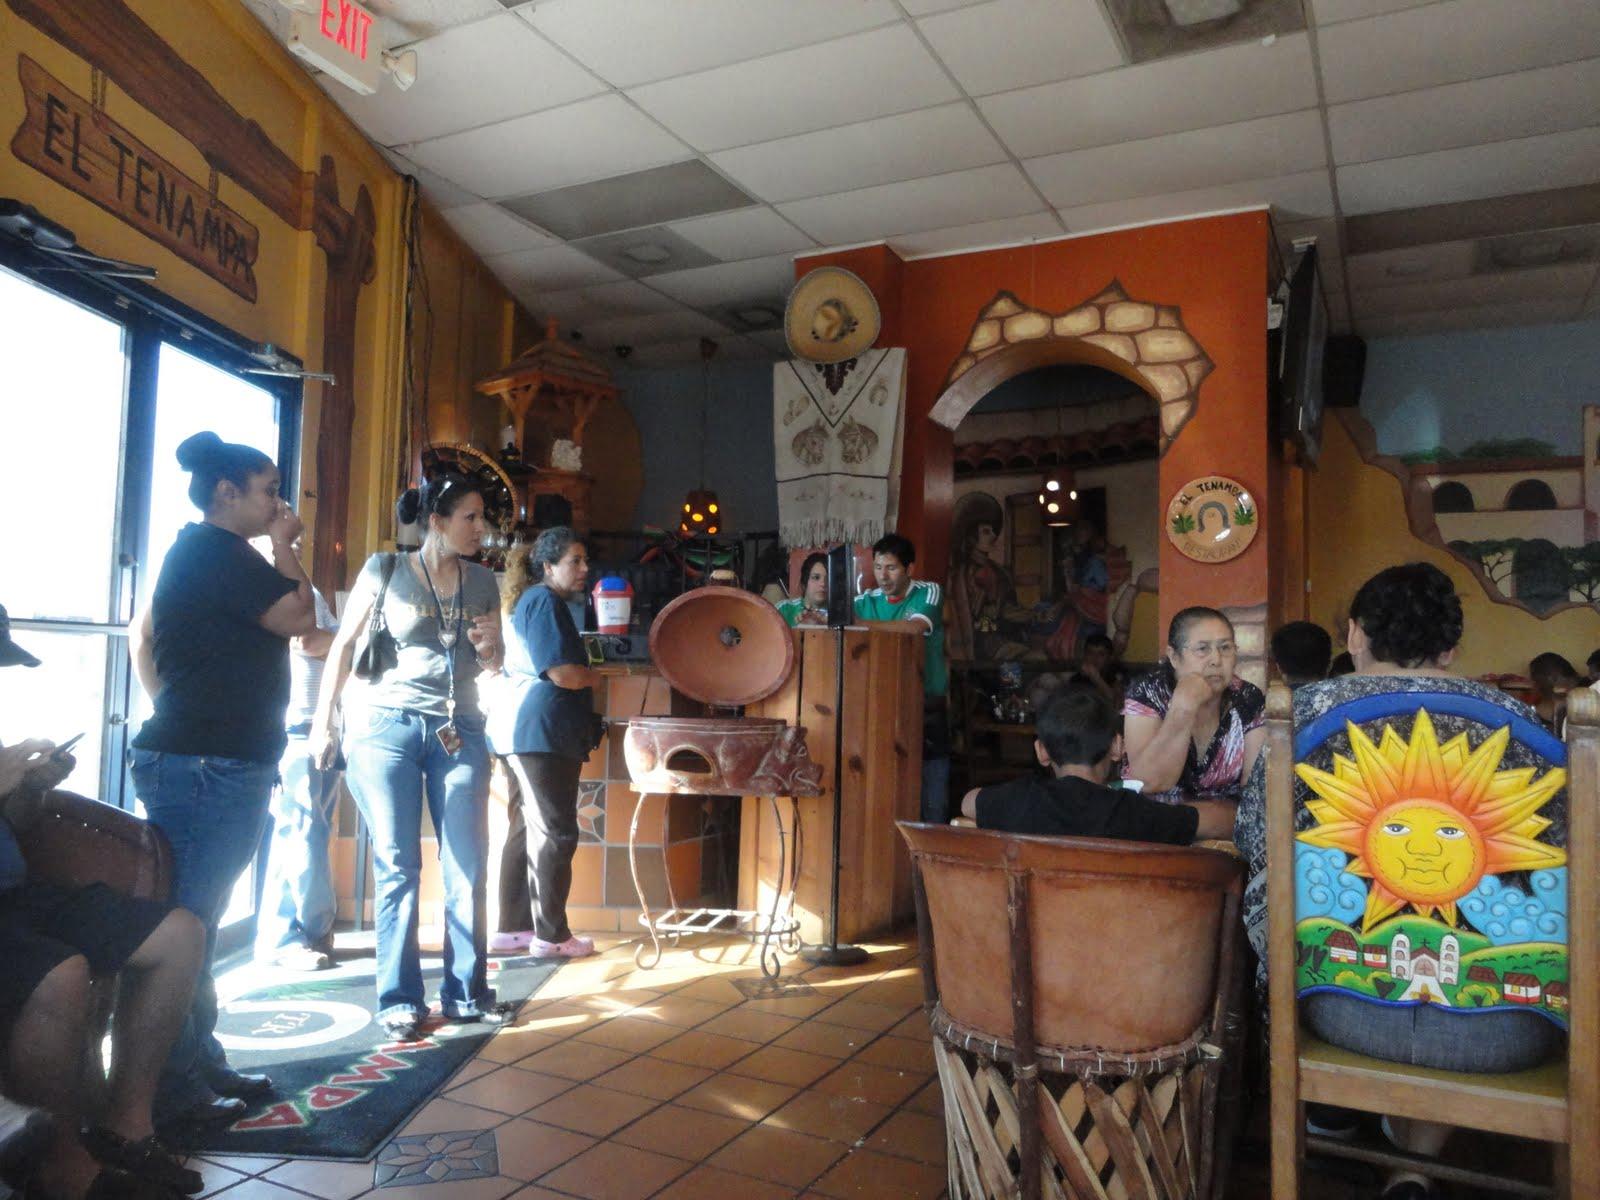 The Florida Dine And Dash El Tenampa Satisfying Trip Abuelo S Hampton Kissimmee Fl Mexican Food Restaurant